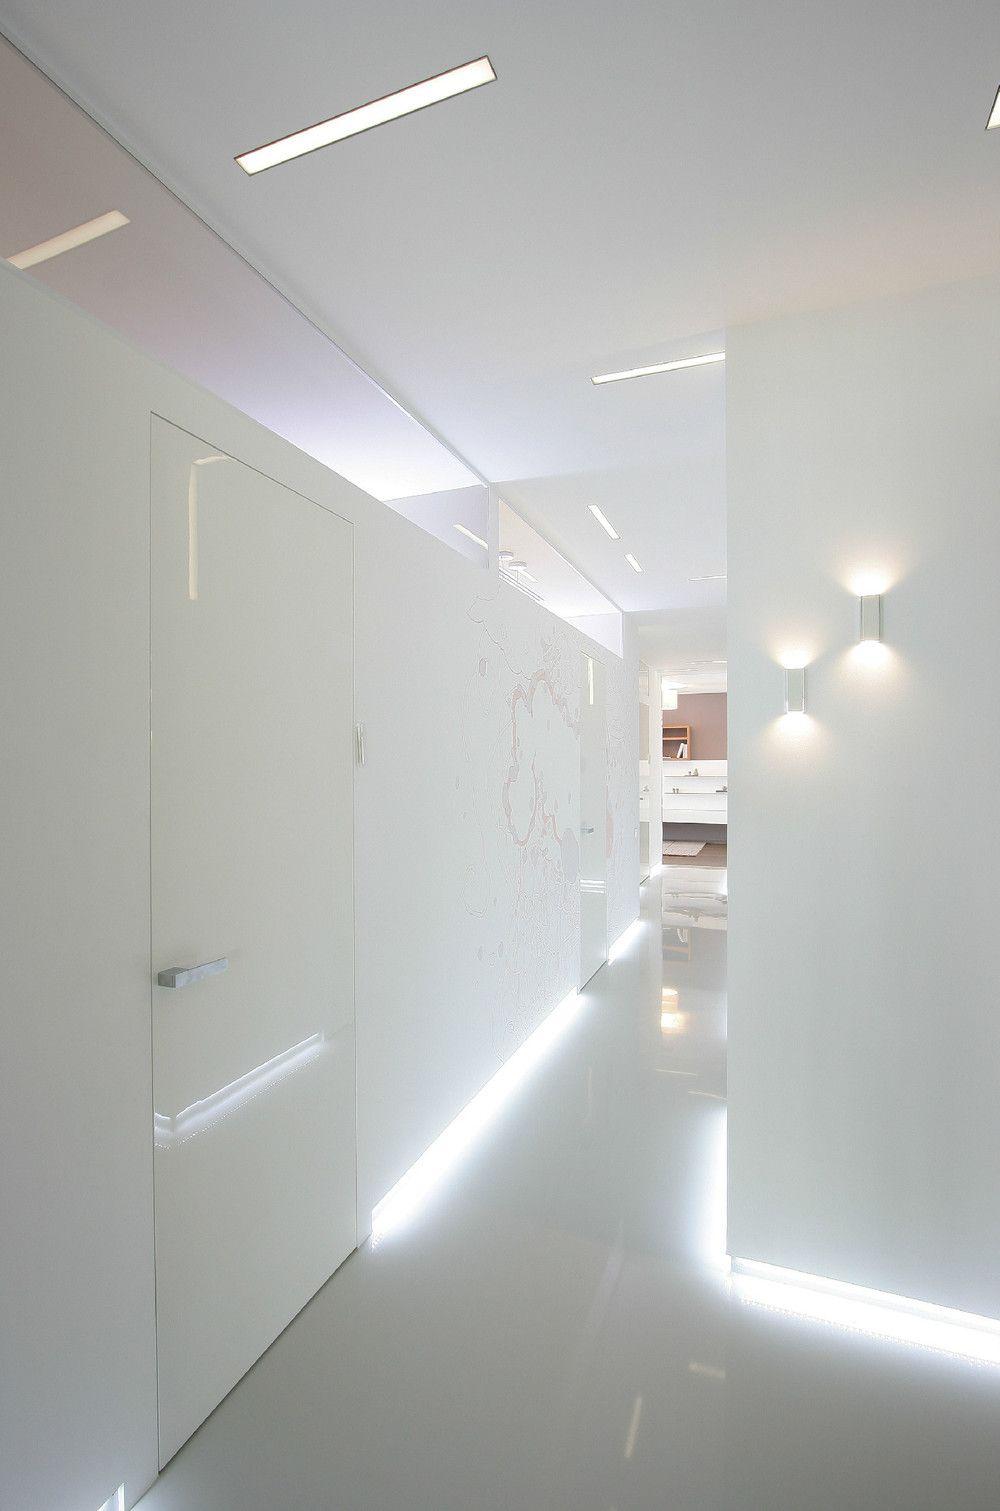 White interior hallway google search macbeto for Interior design wall lighting ideas